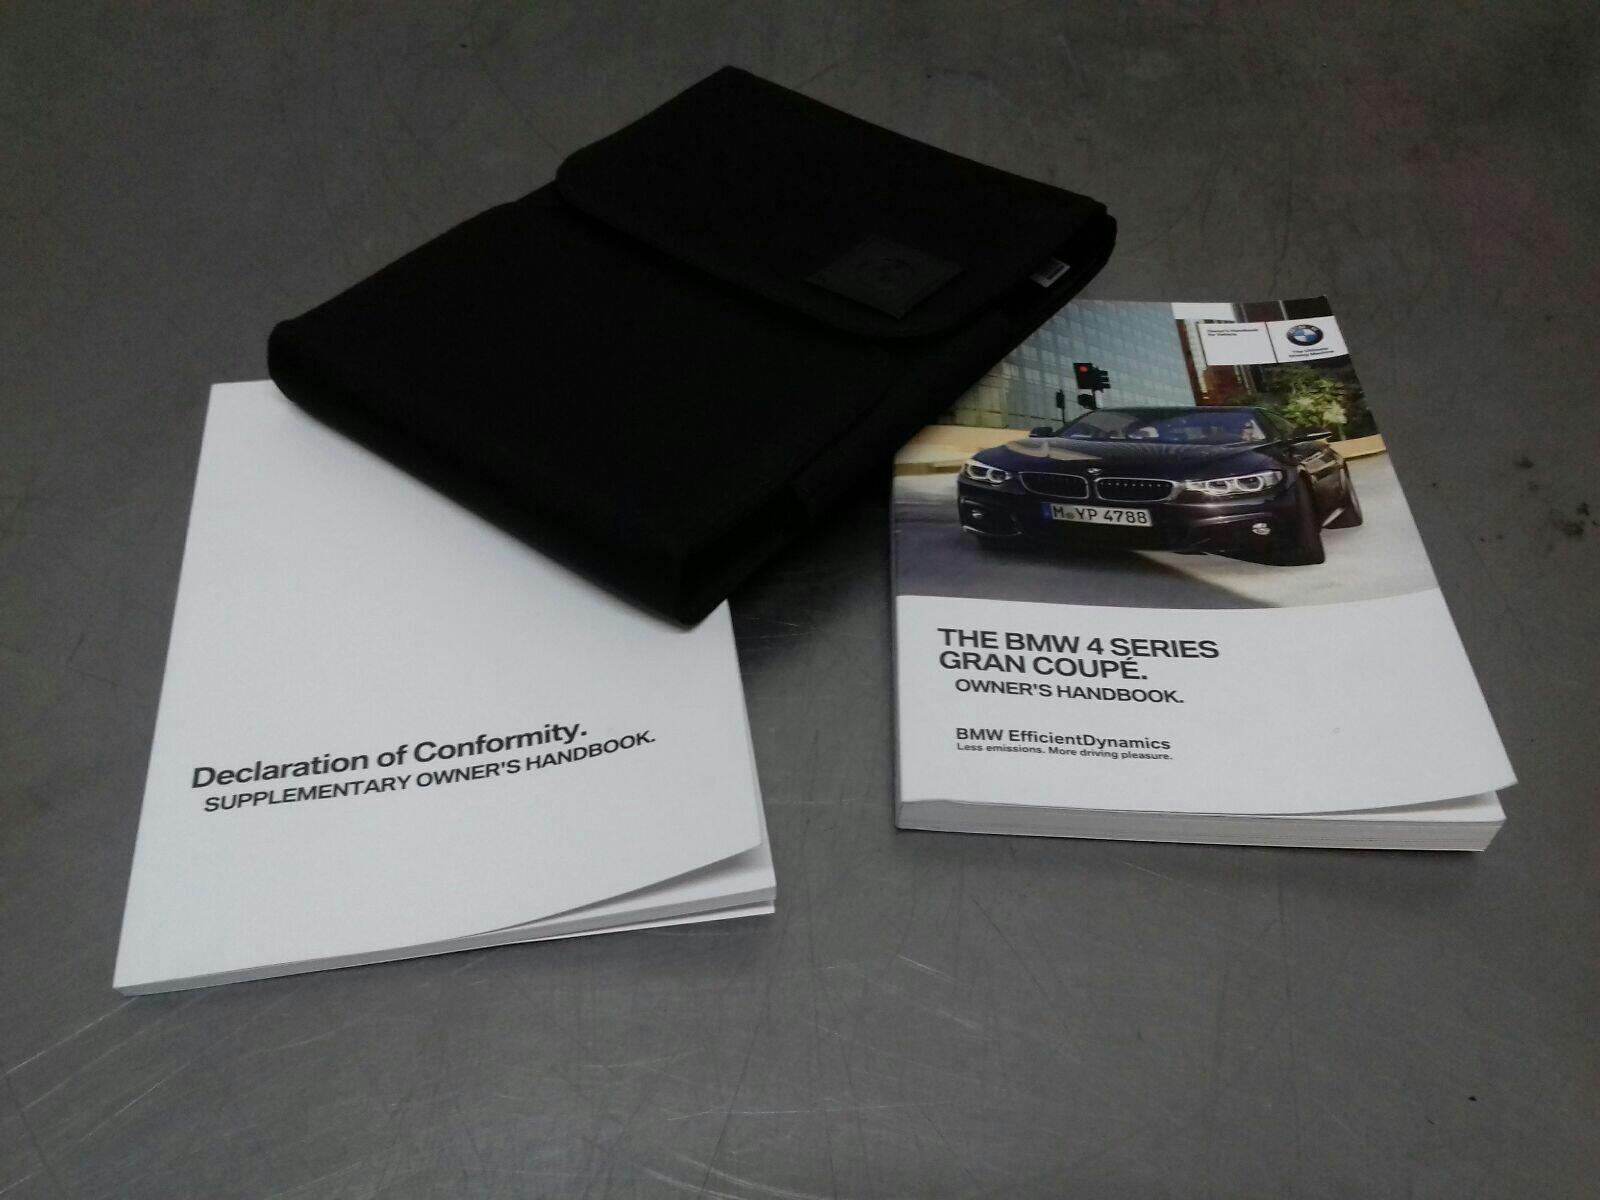 BMW F36 4 SERIES Owners Handbook 01402981532